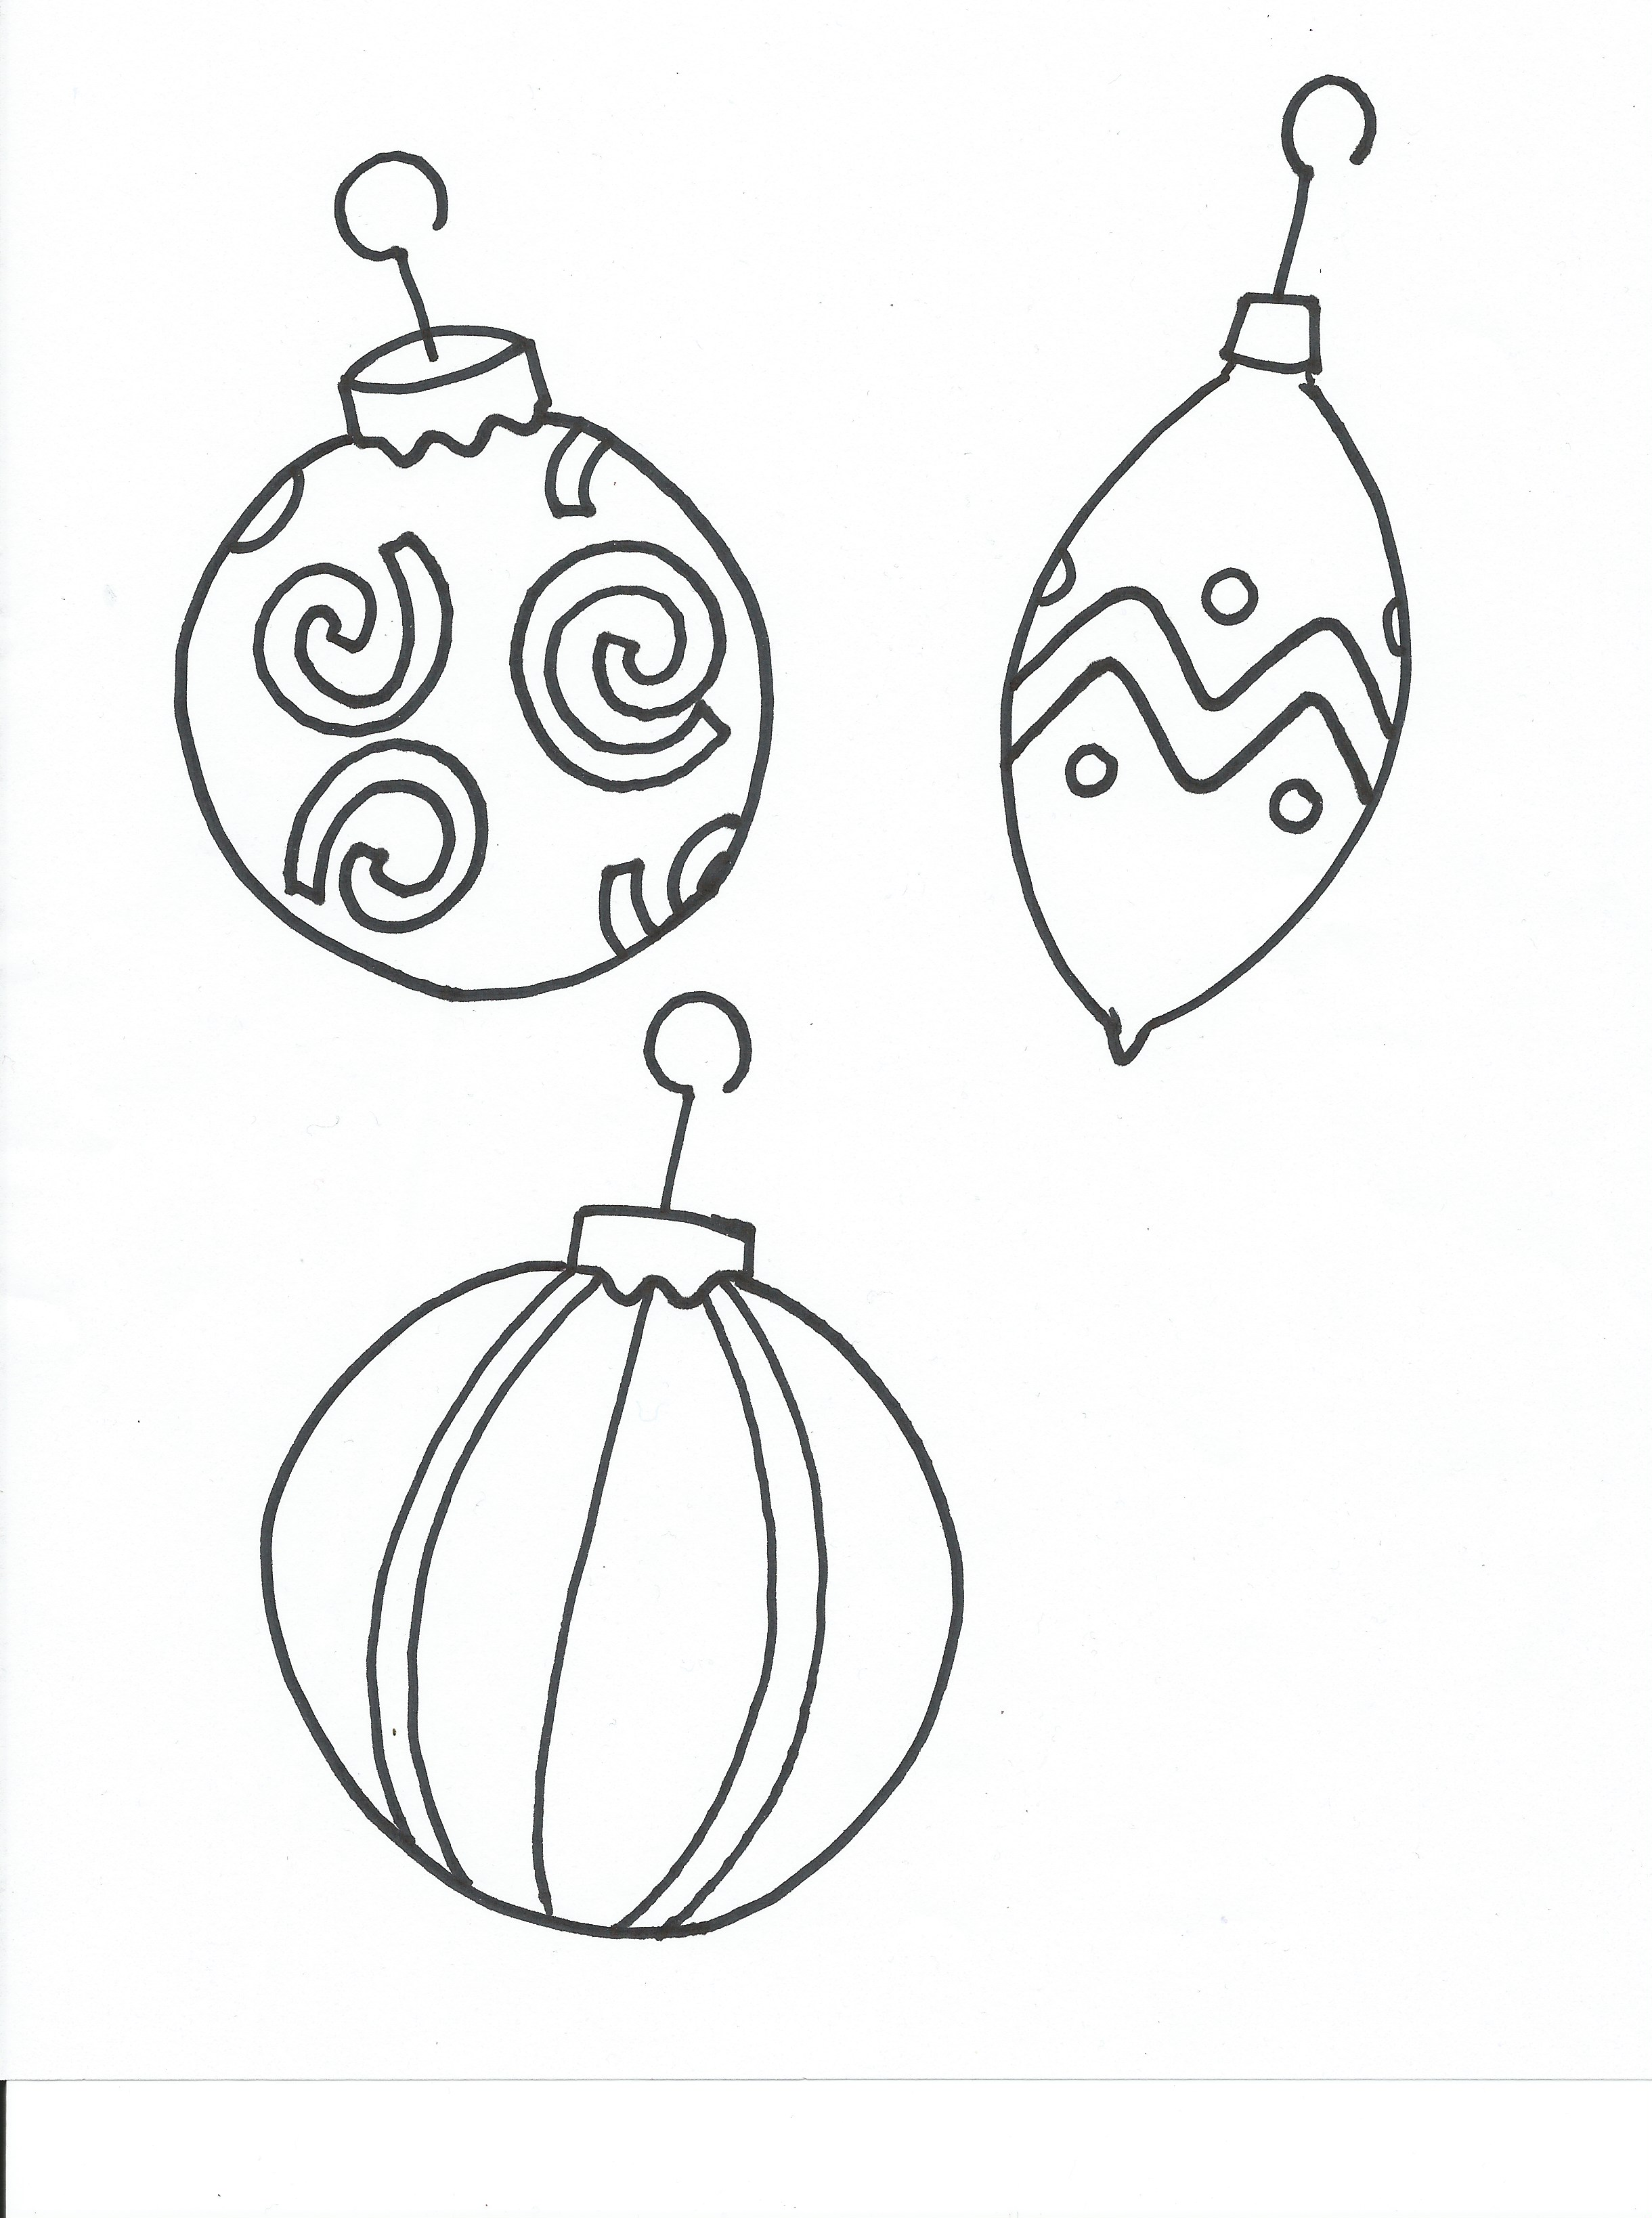 FREE Christmas Ornament Printables Yo Free Samples Christmas Ornaments